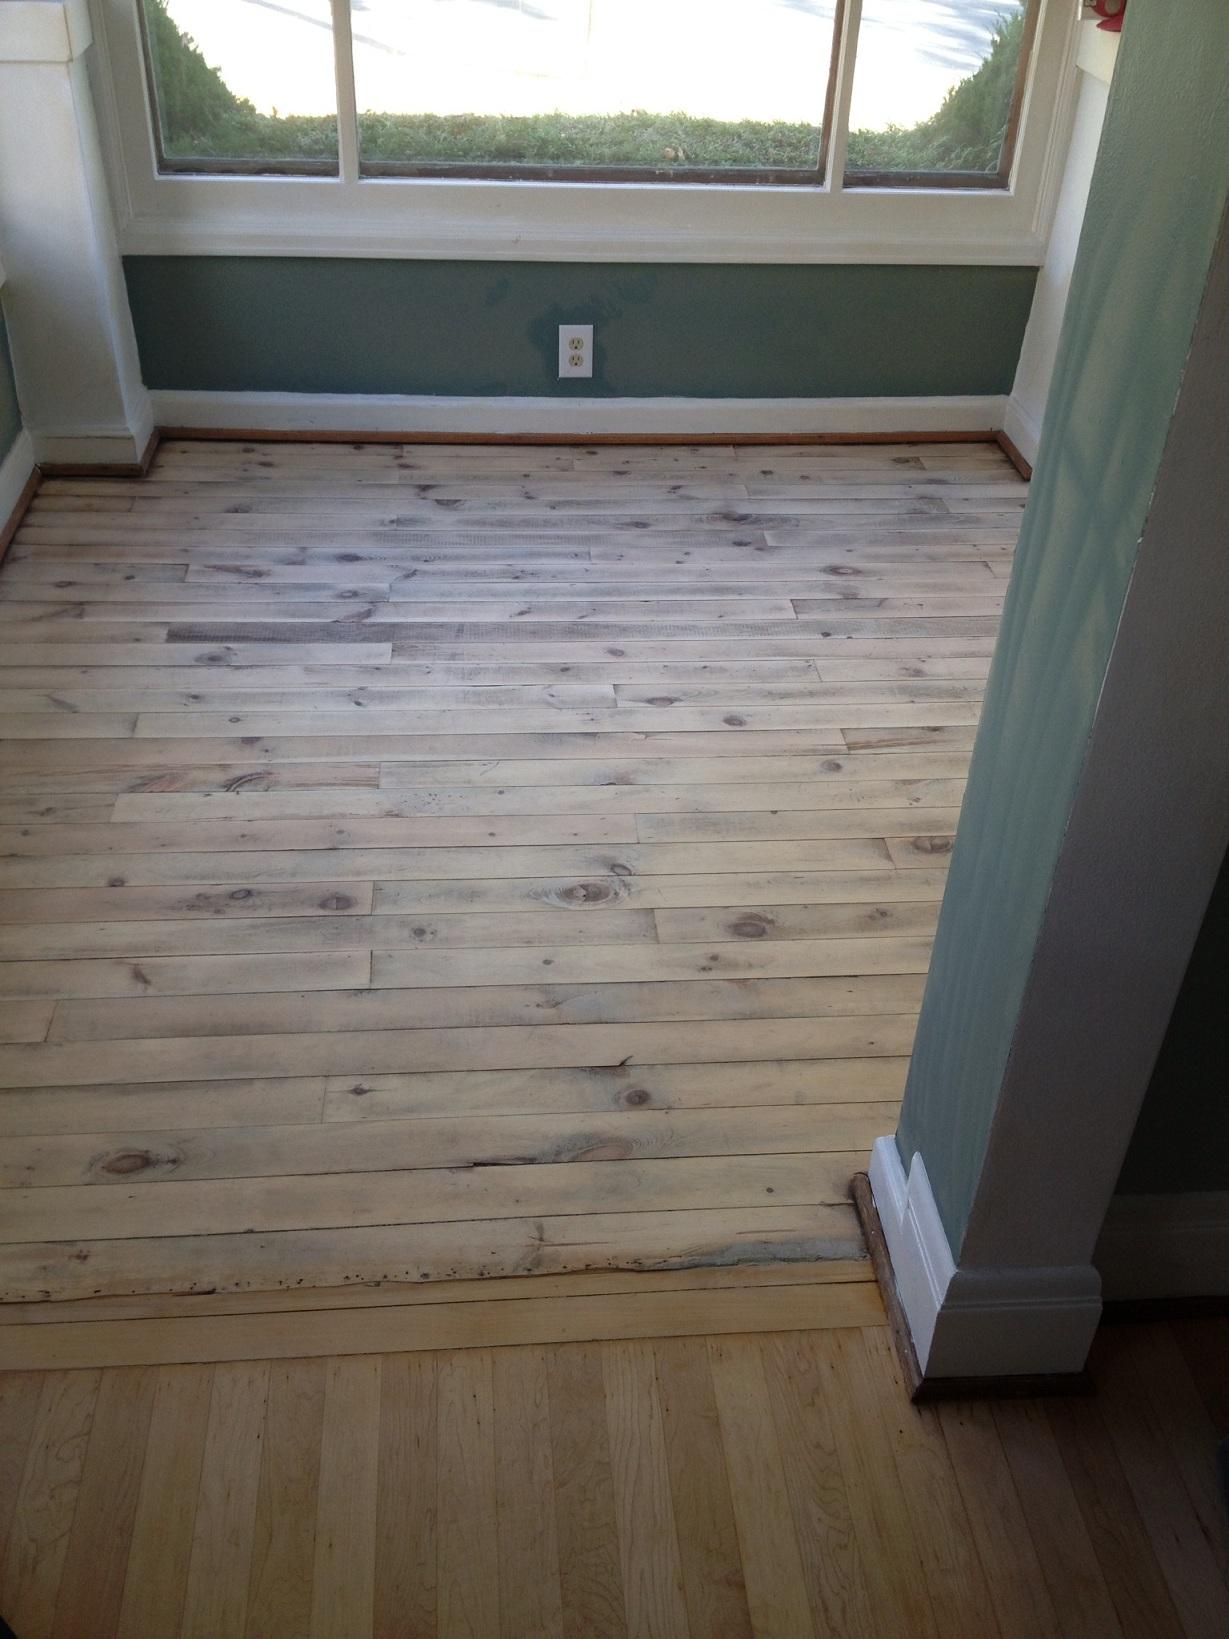 Refinishing painted pine floors thefloors co for Refinishing painted hardwood floors